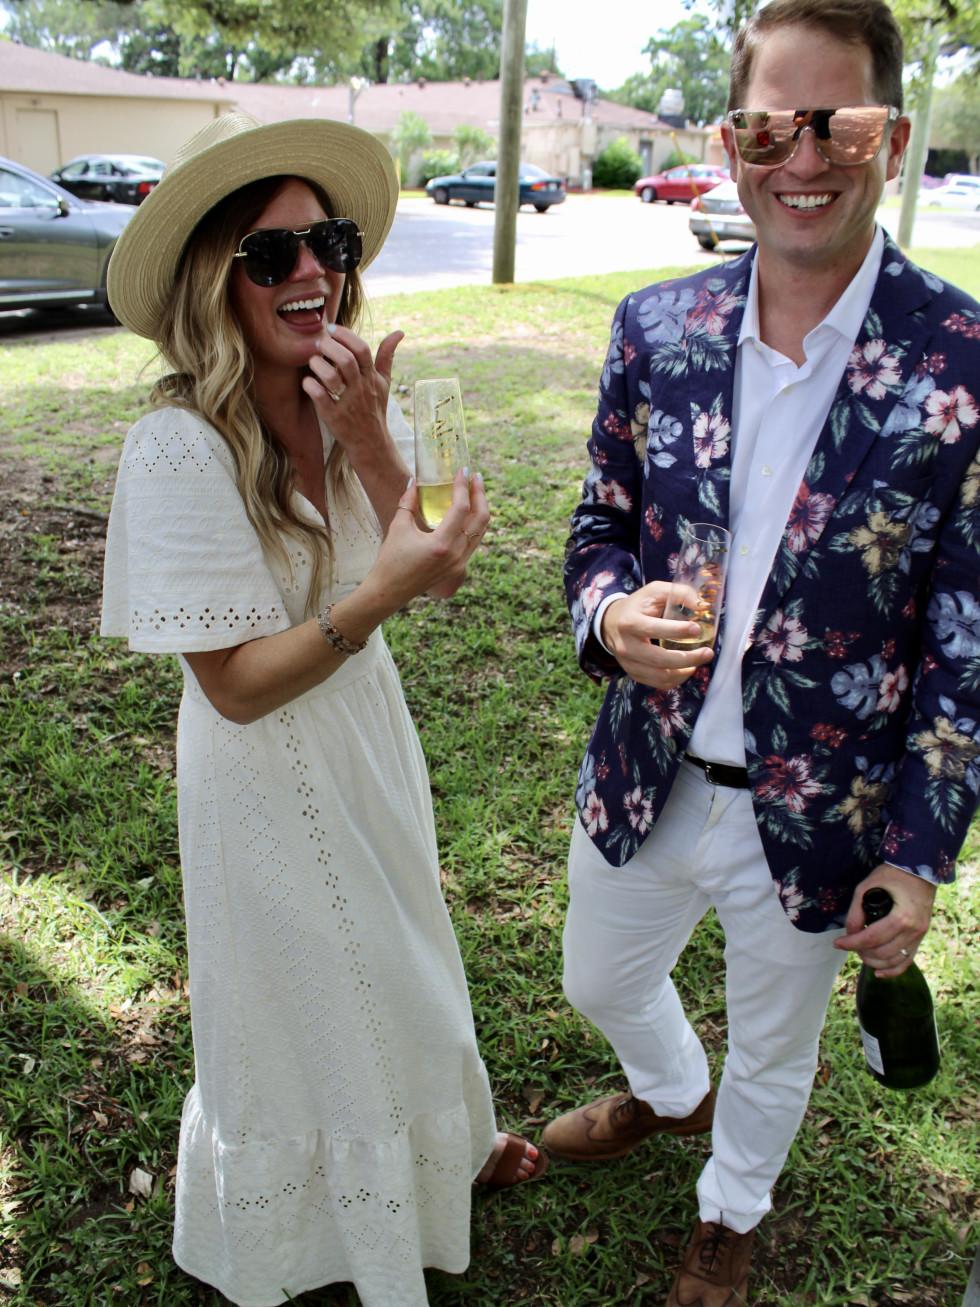 Nick Scurfield Grace Gibson wedding Houston